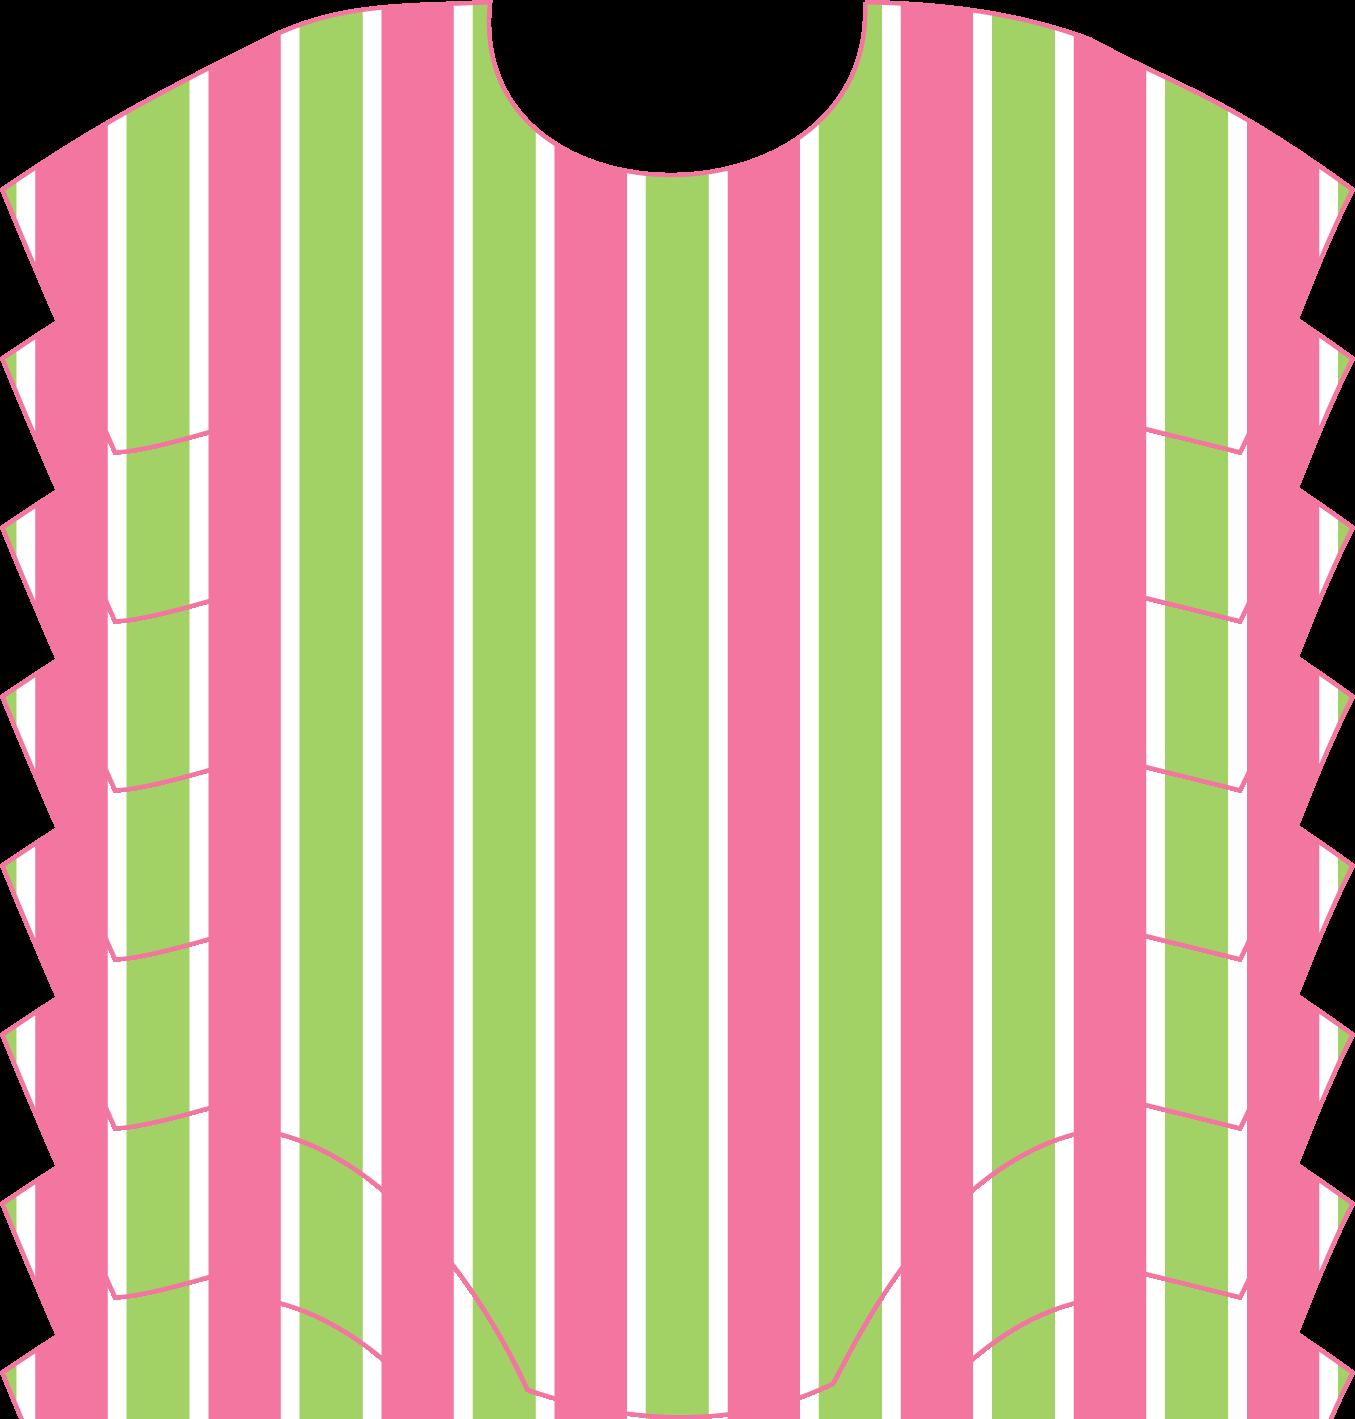 Http sgaguilarmjargueso blogspot mx. Label clipart baby shower